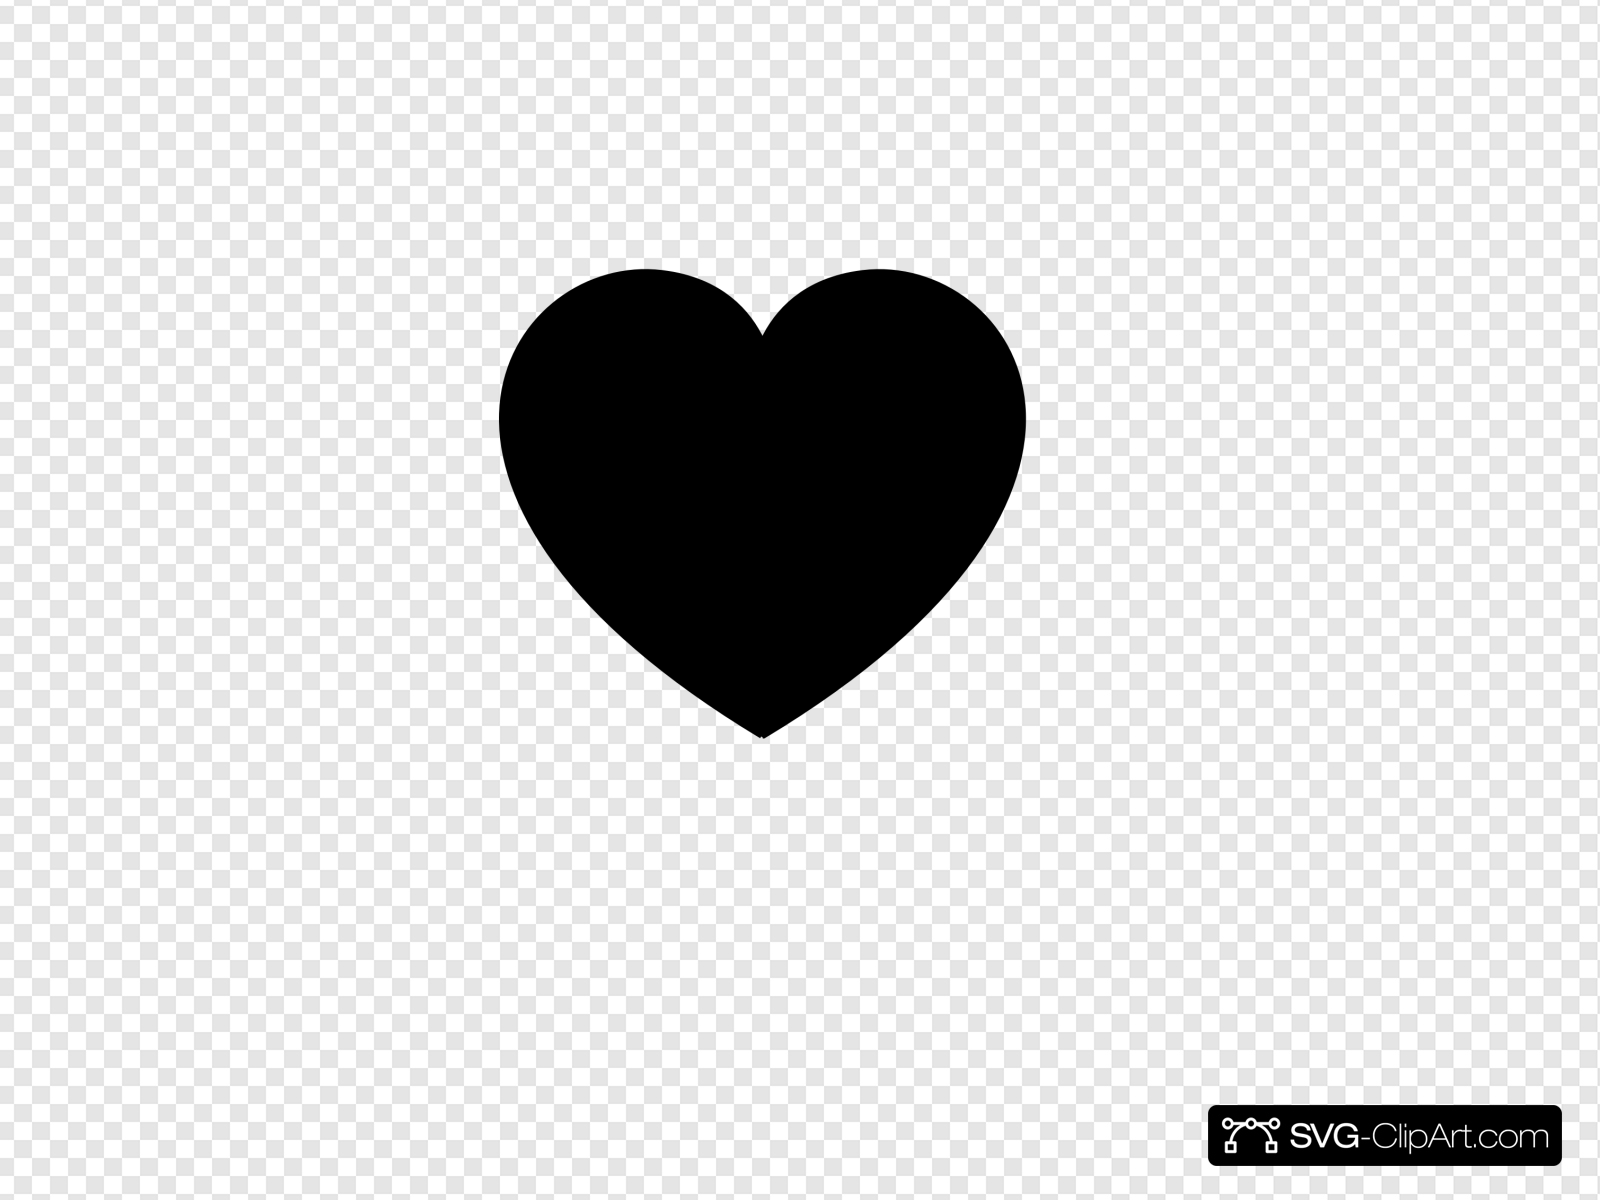 Black Heart Clip art, Icon and SVG.